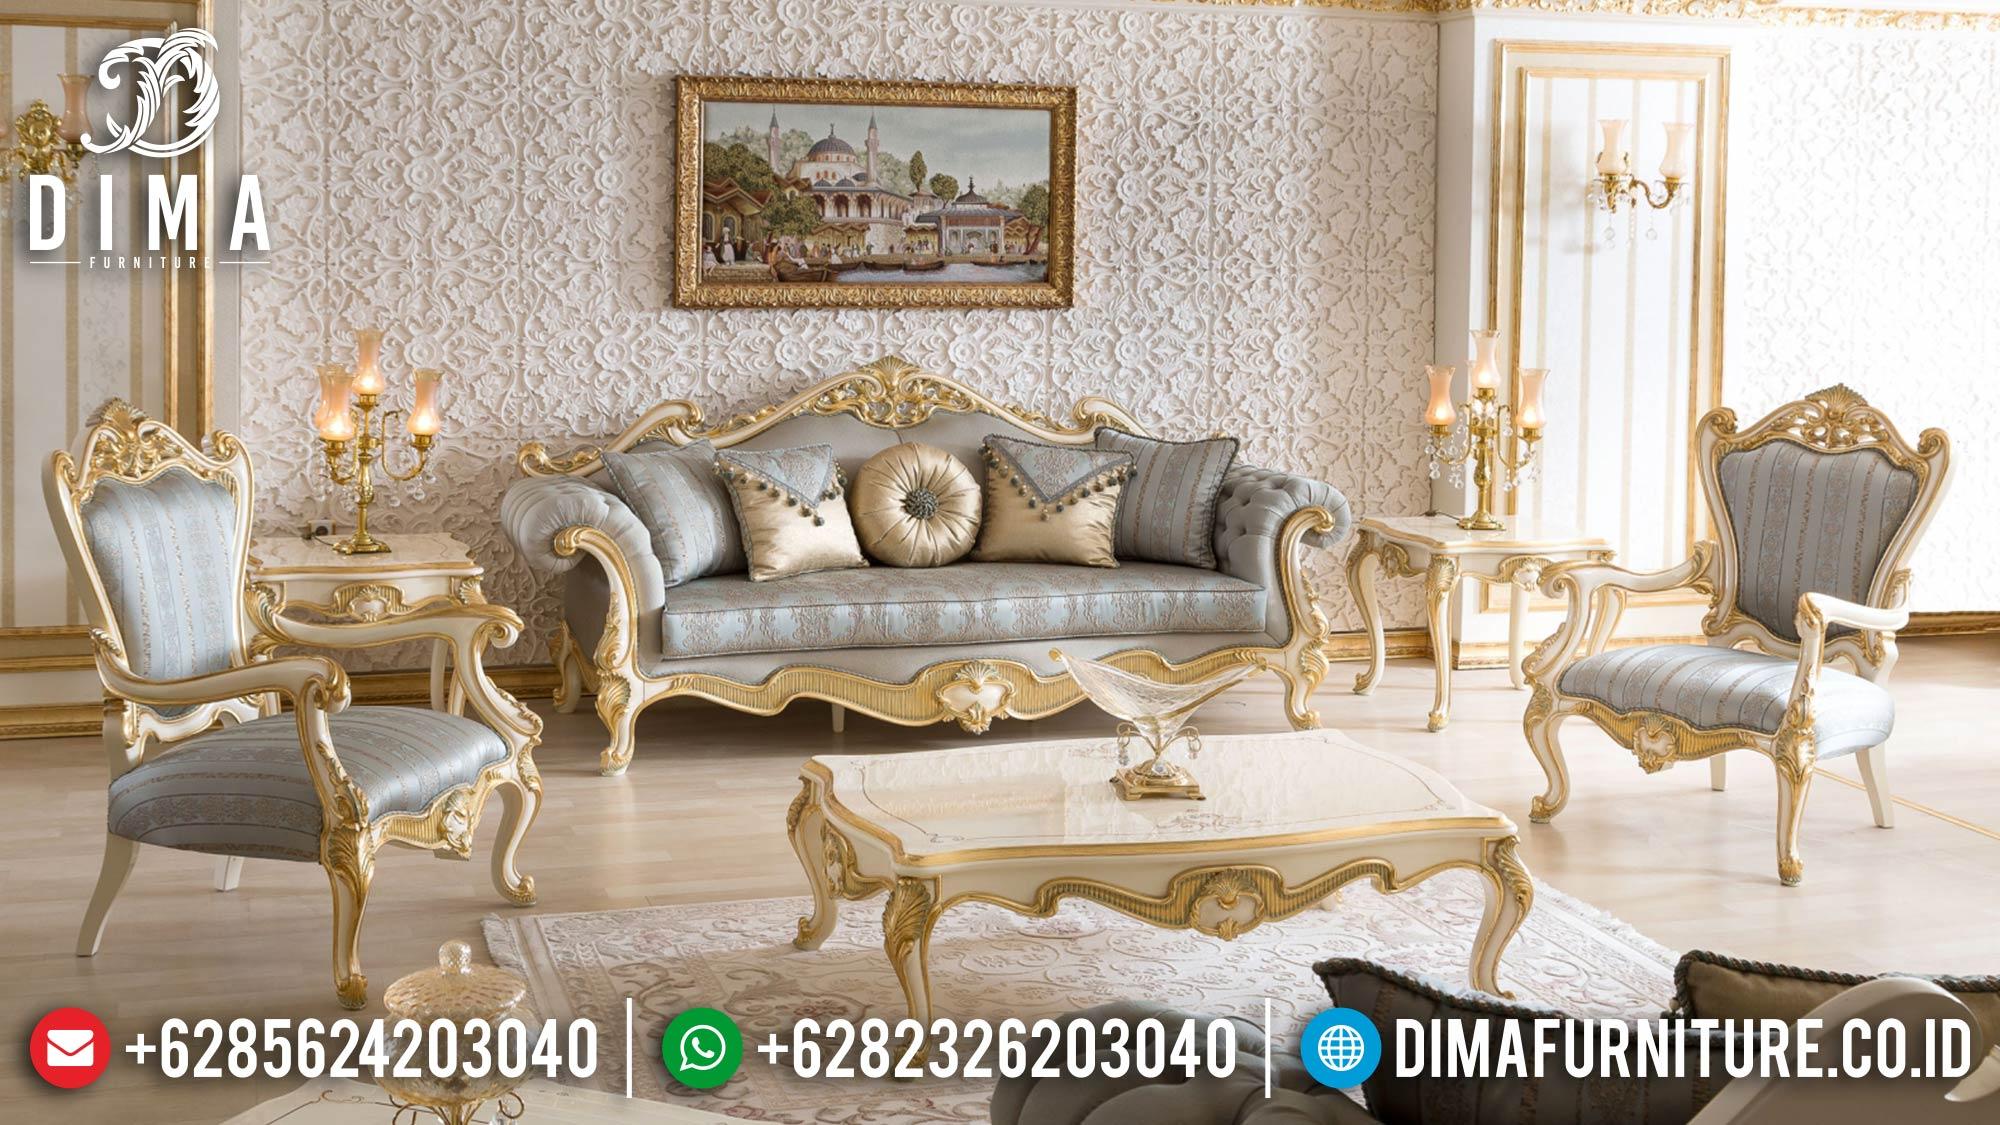 Majestic Style Sofa Tamu Ukiran Mewah Luxury Golden Carving Combination Mm-0965